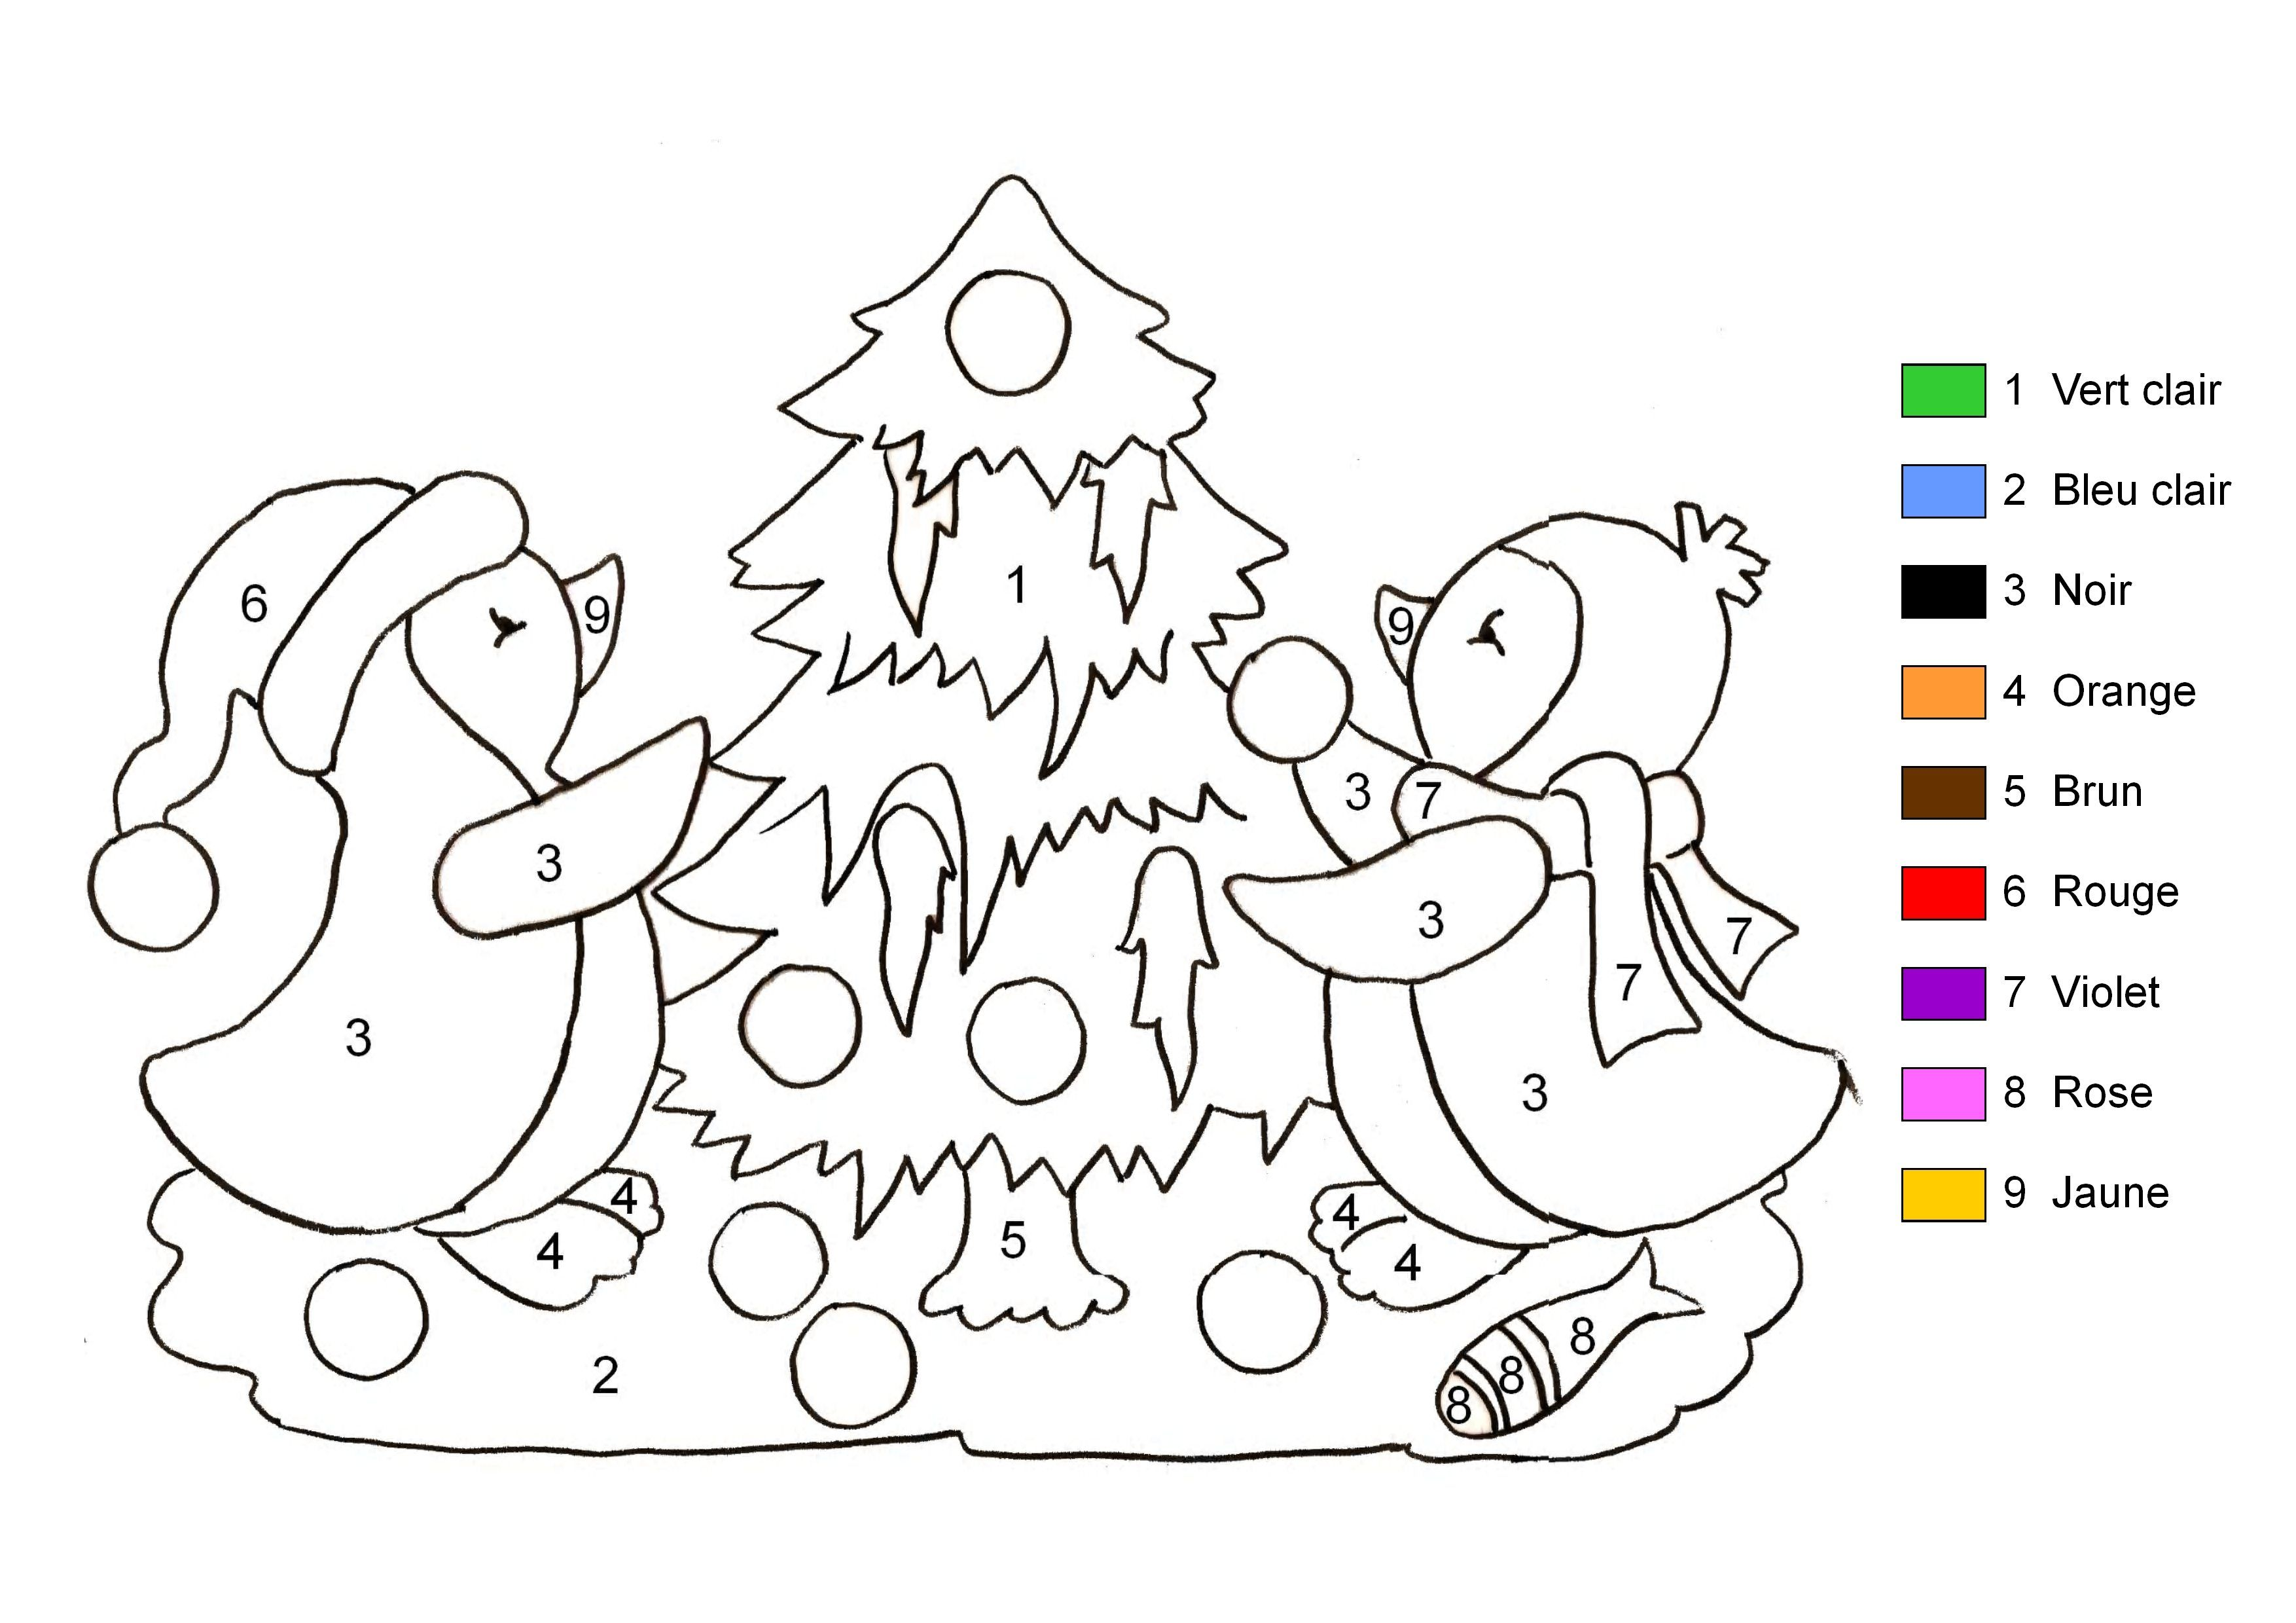 imprimer coloriage noel coloriage coloriage magique. Black Bedroom Furniture Sets. Home Design Ideas